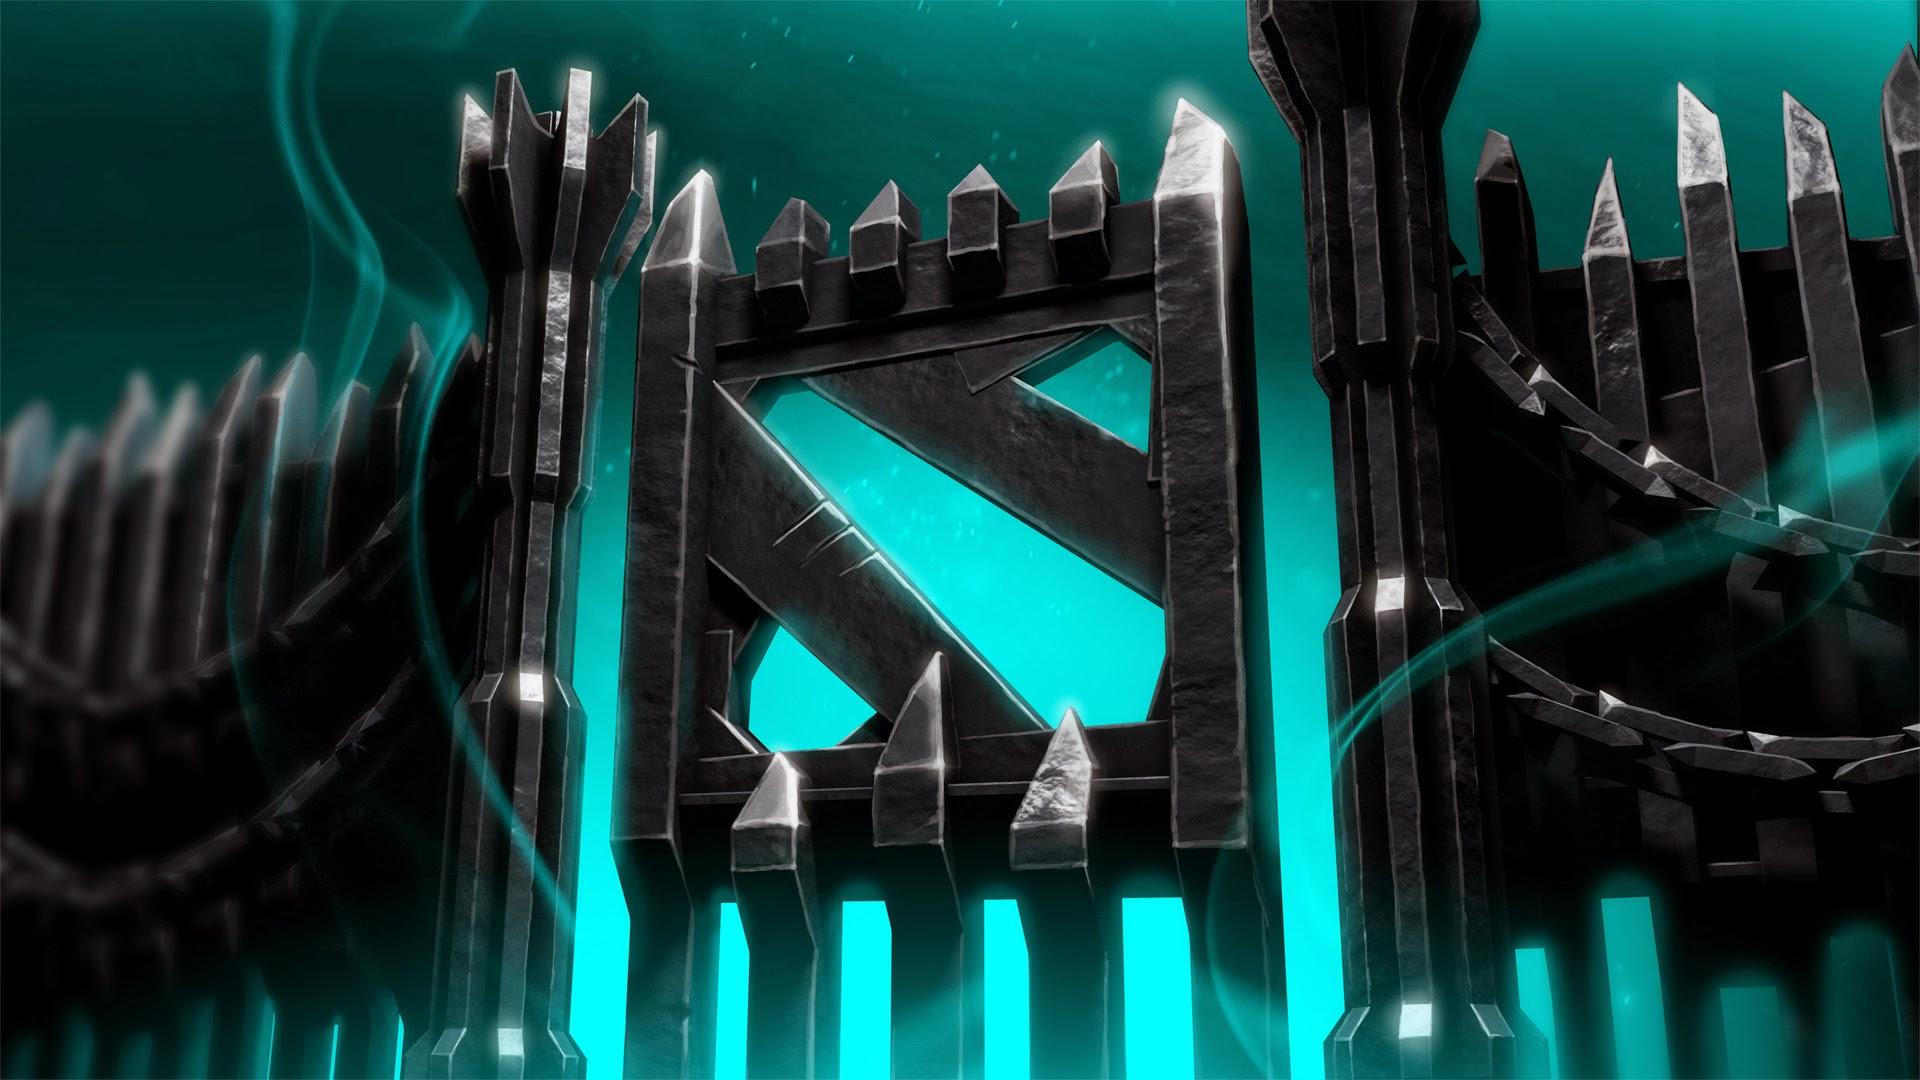 Iron Cage logo Dota 2 wallpapers Dota 2 HD